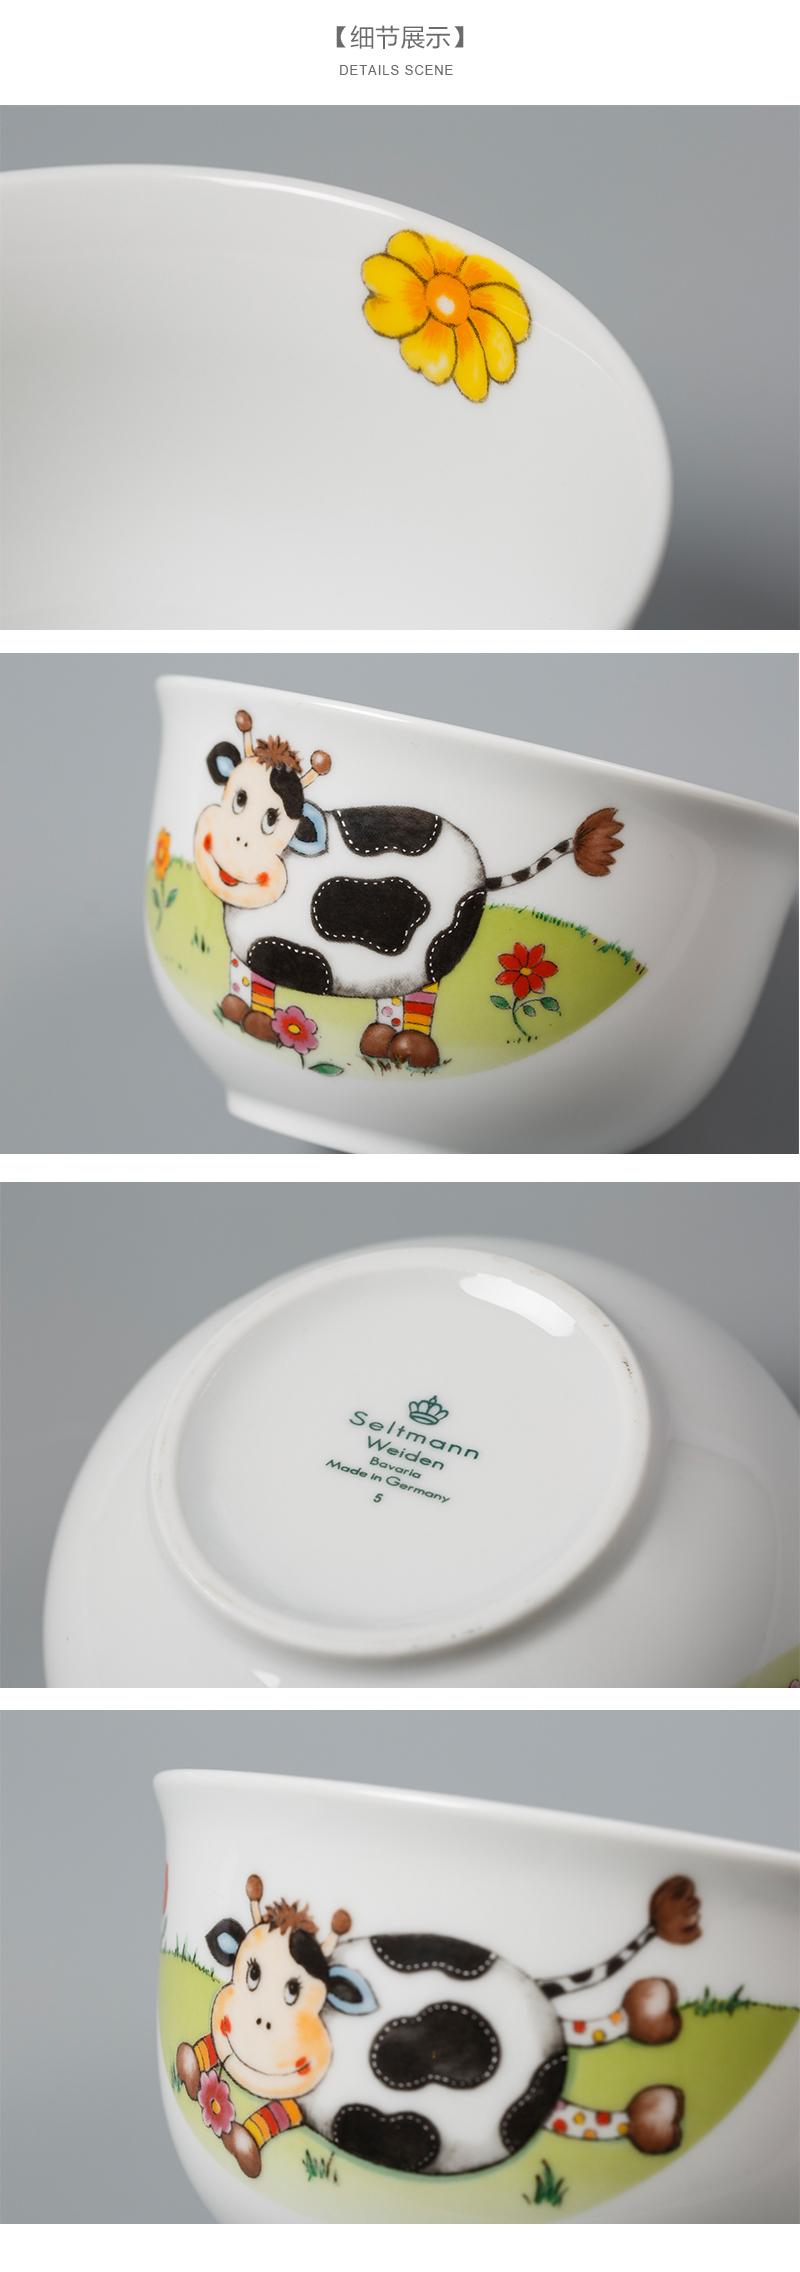 Seltmann Weiden动物图案陶瓷碗细节展示